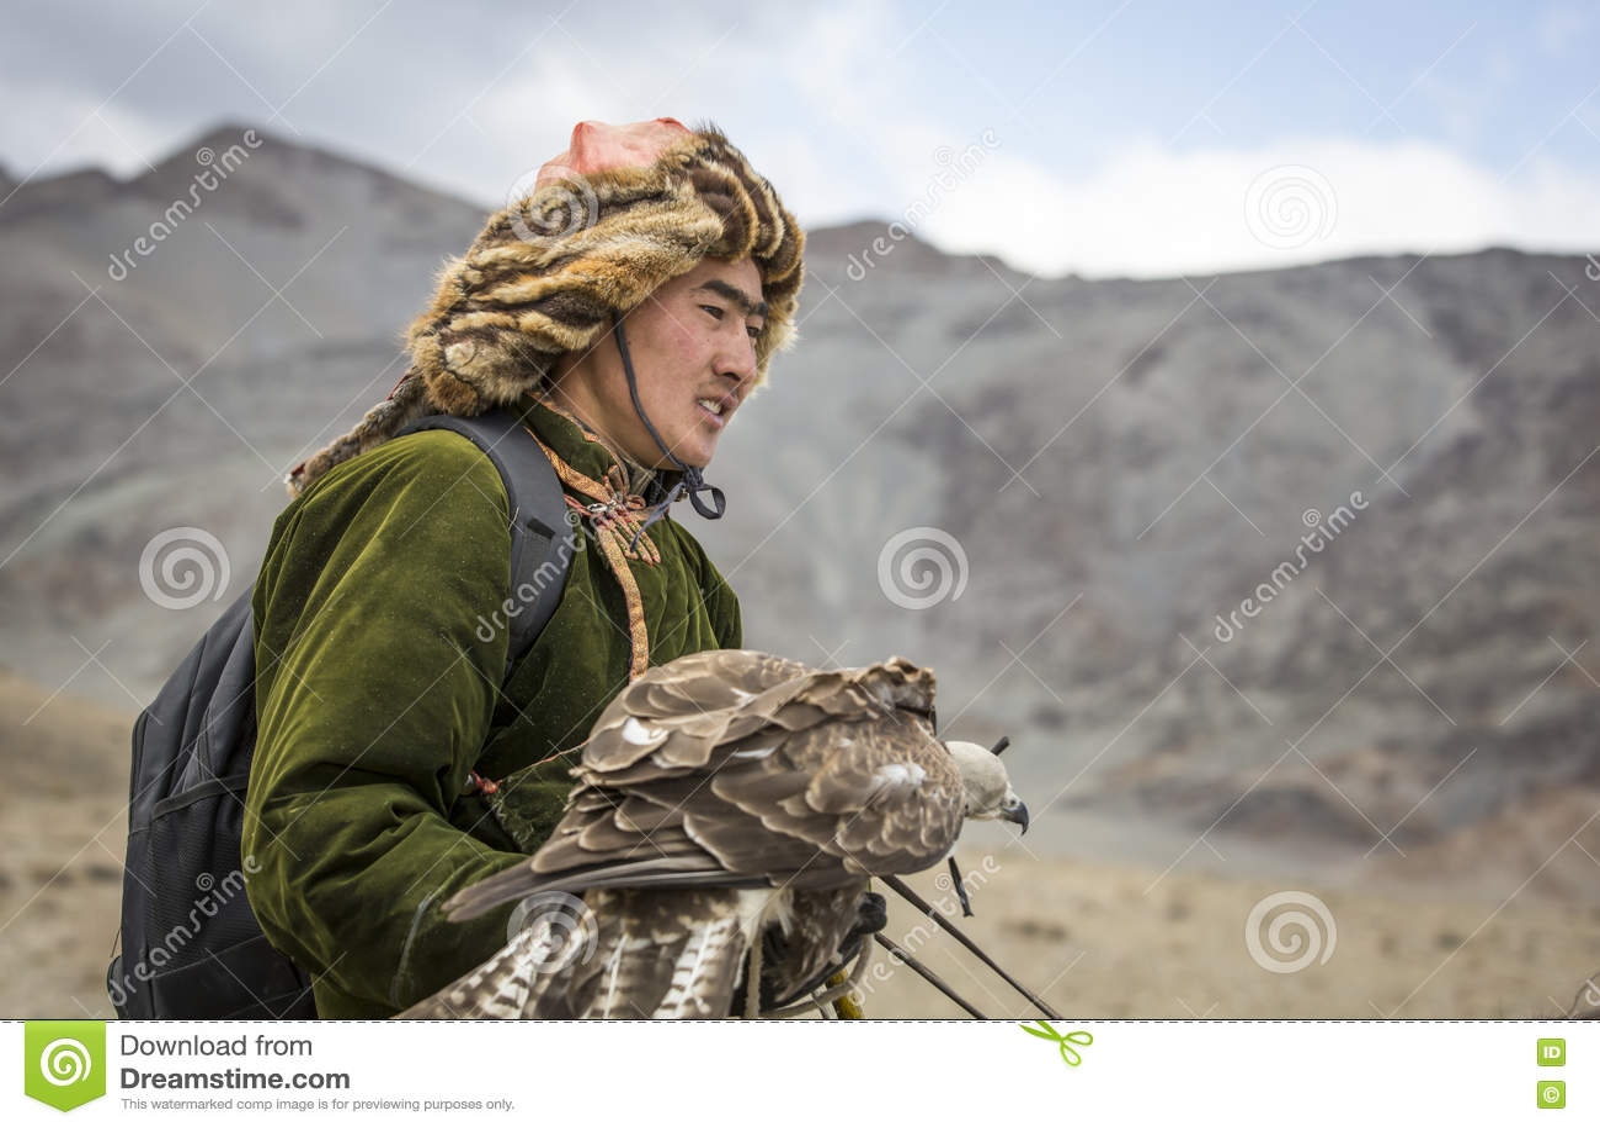 mongolian-nomad-eagle-hunter-his-eagle-b